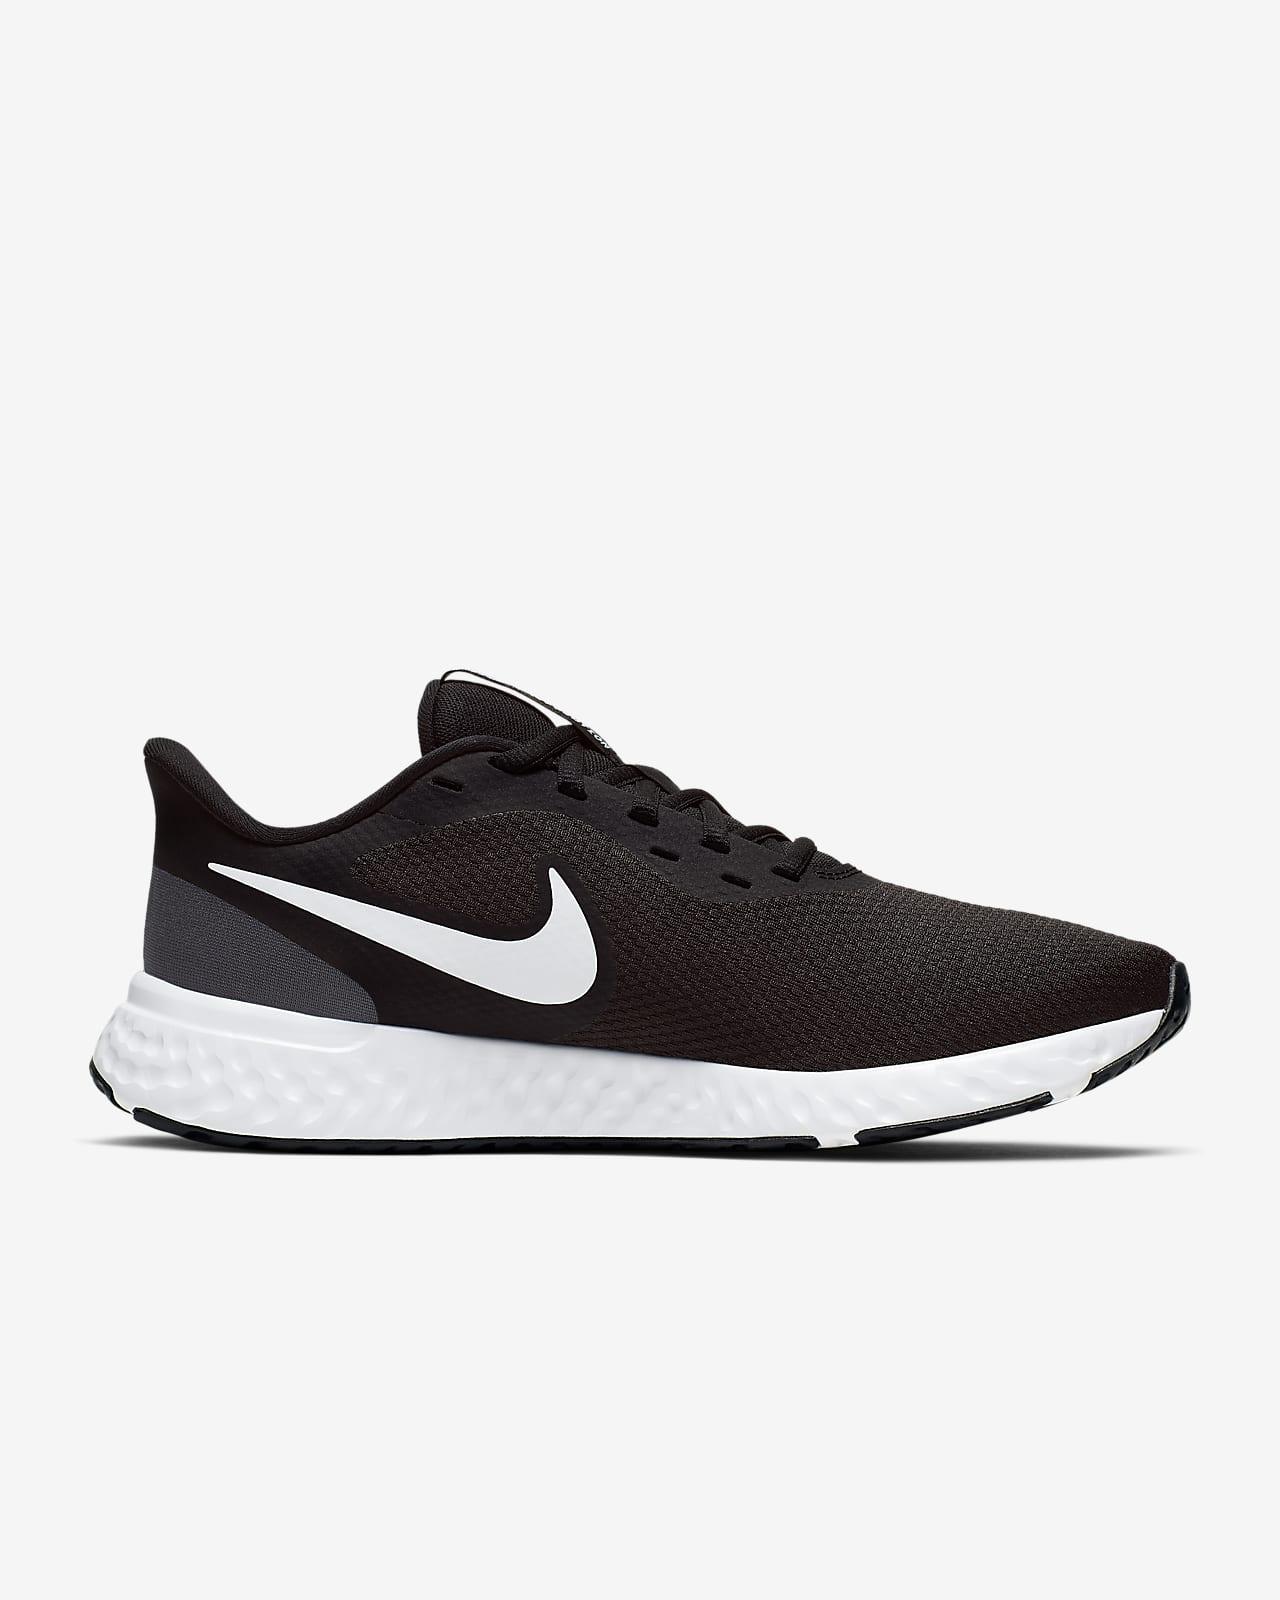 Personas mayores perdí mi camino Cambiable  Nike Revolution 5 Women's Running Shoe. Nike BE